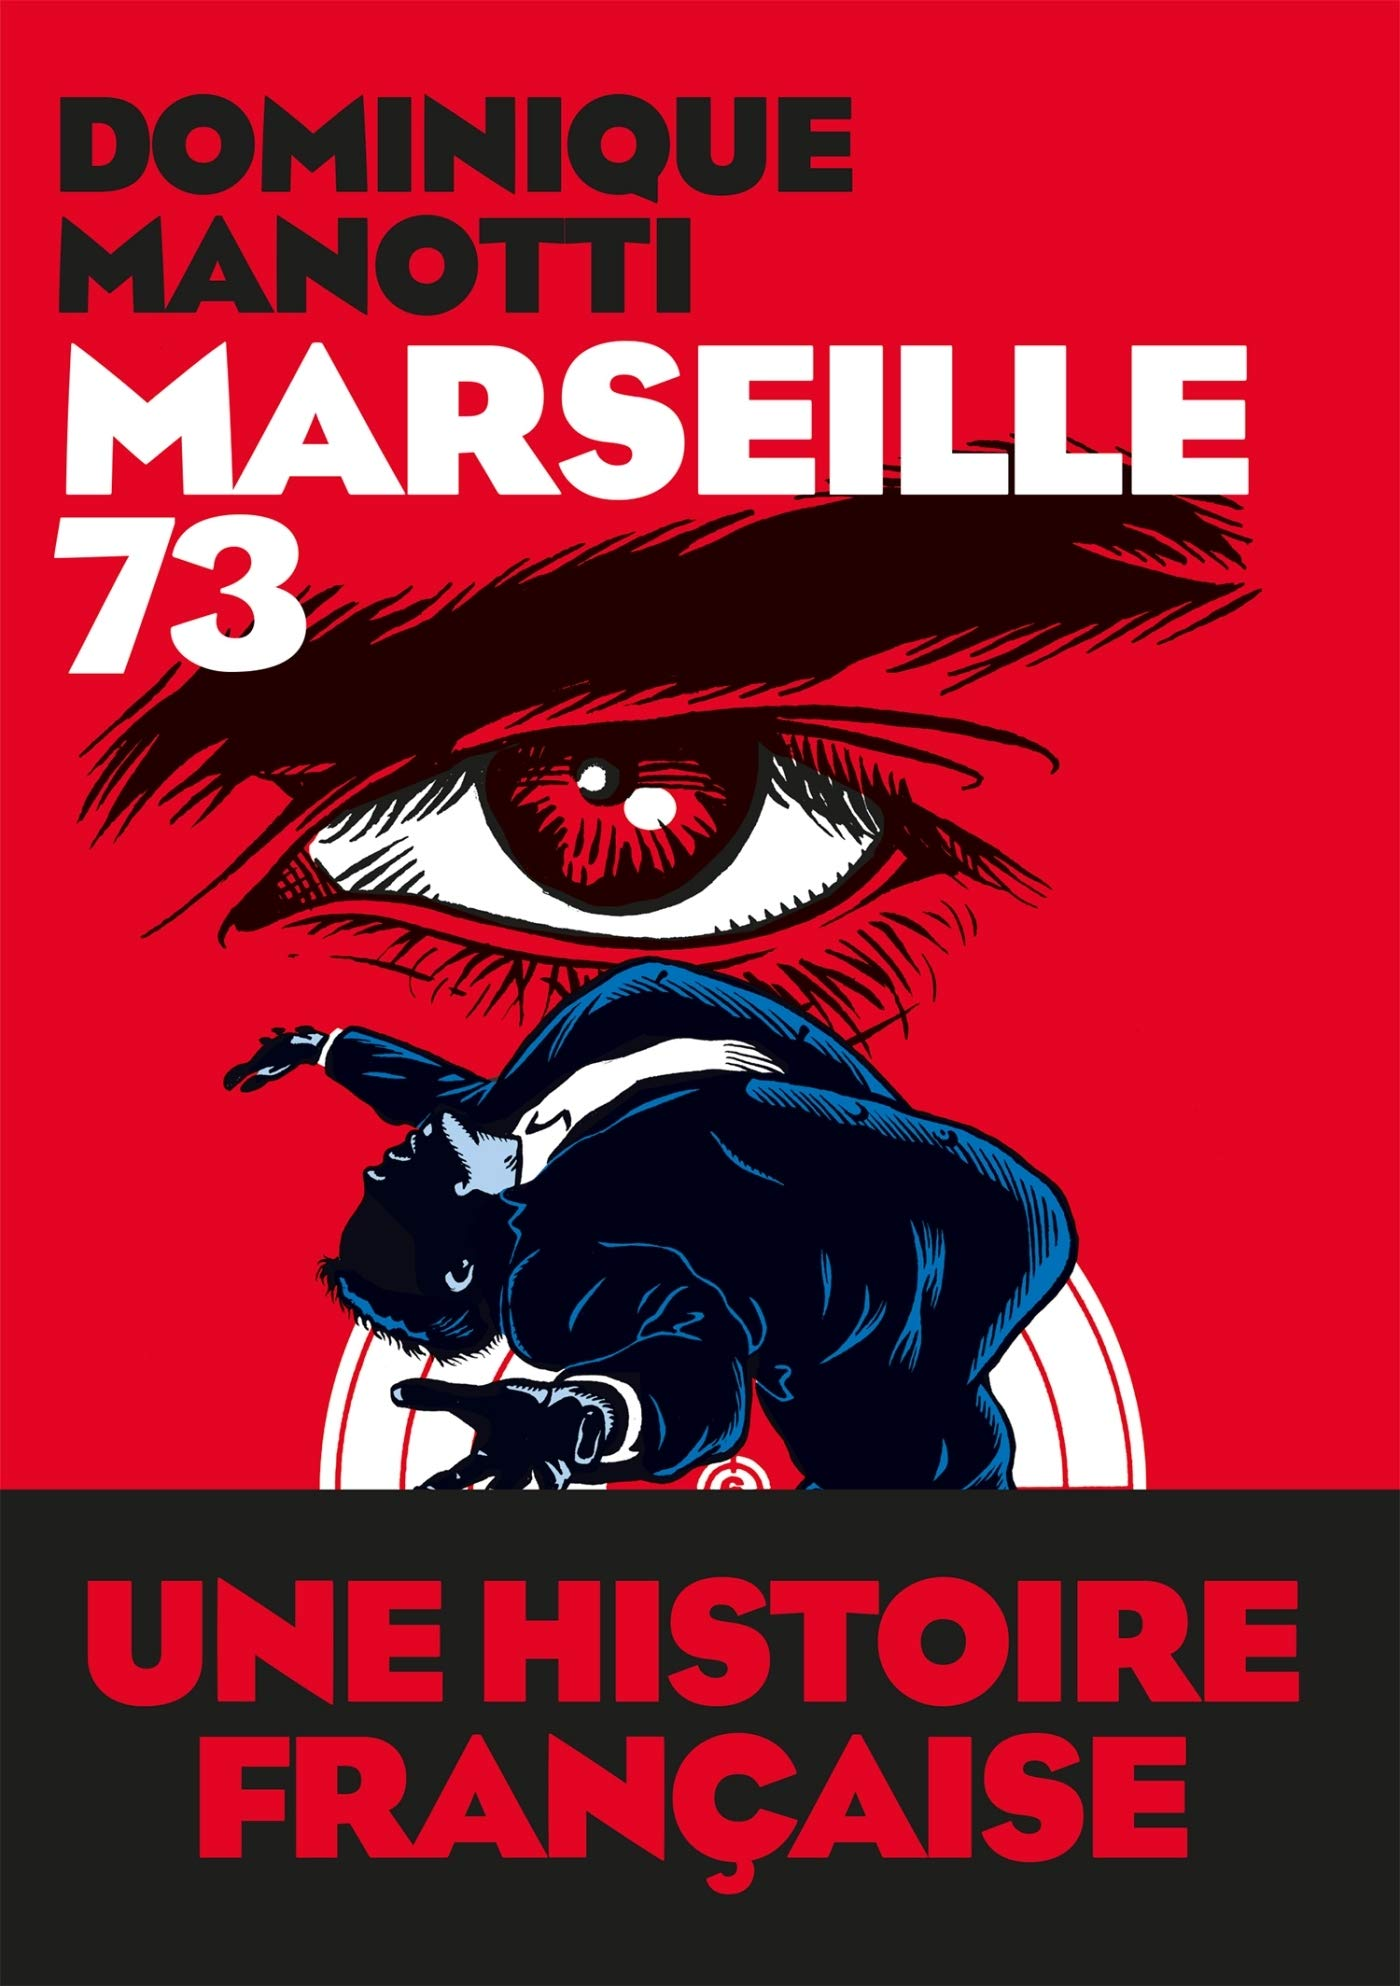 Amazon.fr - Marseille 73 - Manotti, Dominique - Livres